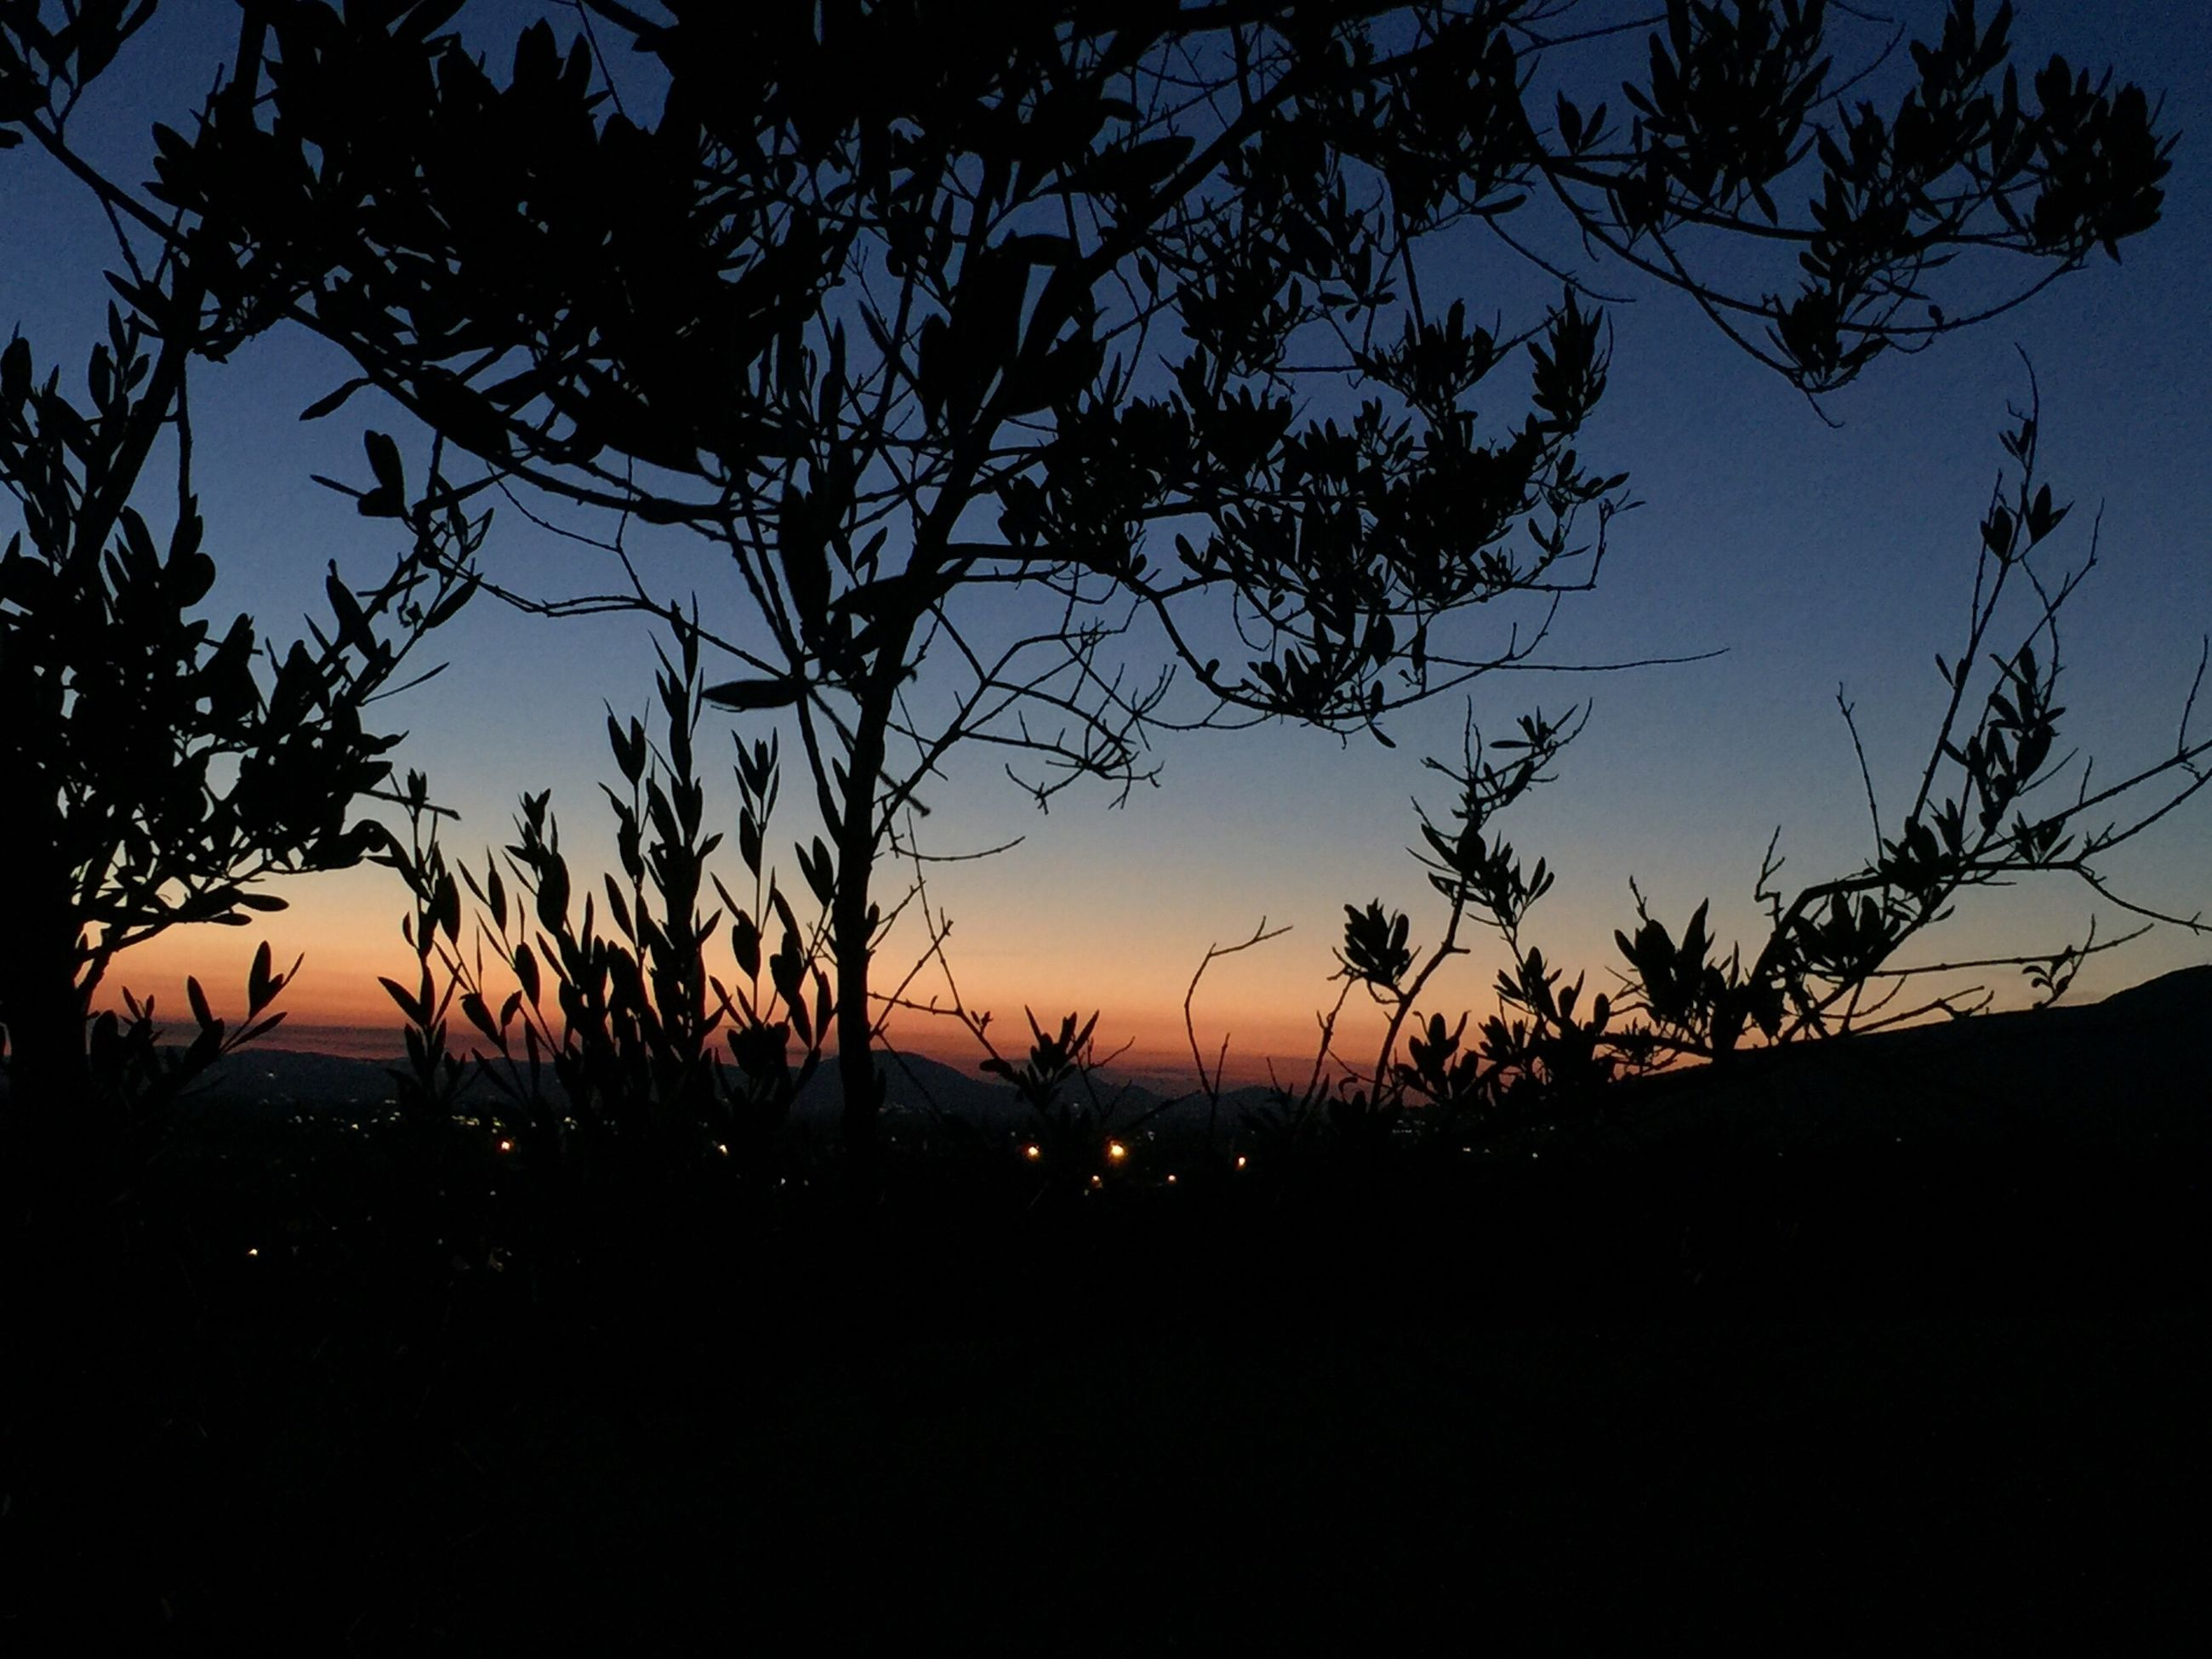 sunset, silhouette, tranquility, tree, tranquil scene, scenics, beauty in nature, orange color, sky, nature, sun, dark, idyllic, landscape, bare tree, outline, growth, outdoors, no people, majestic, non-urban scene, non urban scene, remote, glowing, cloud